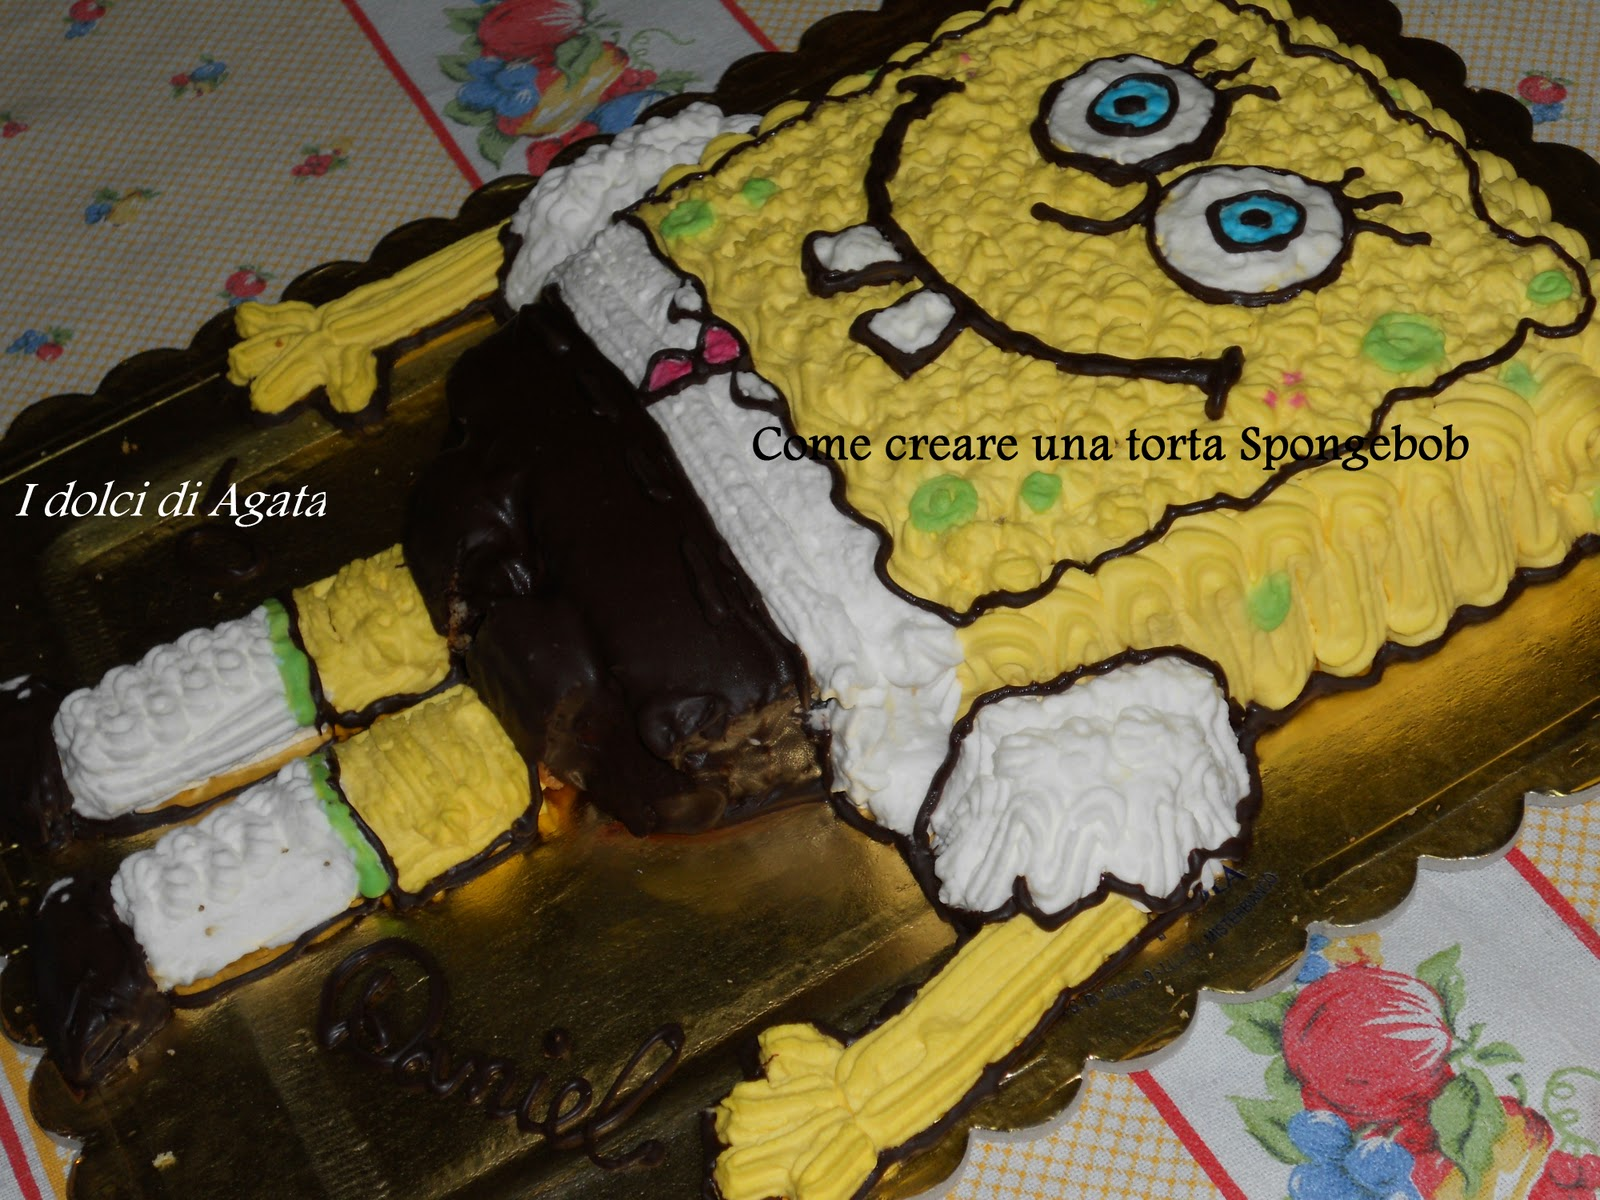 http://2.bp.blogspot.com/-1o0KJRh-mGg/To12WMlOQKI/AAAAAAAABGM/L6wdSWfoueI/s1600/Torta+spongebob+7.jpg